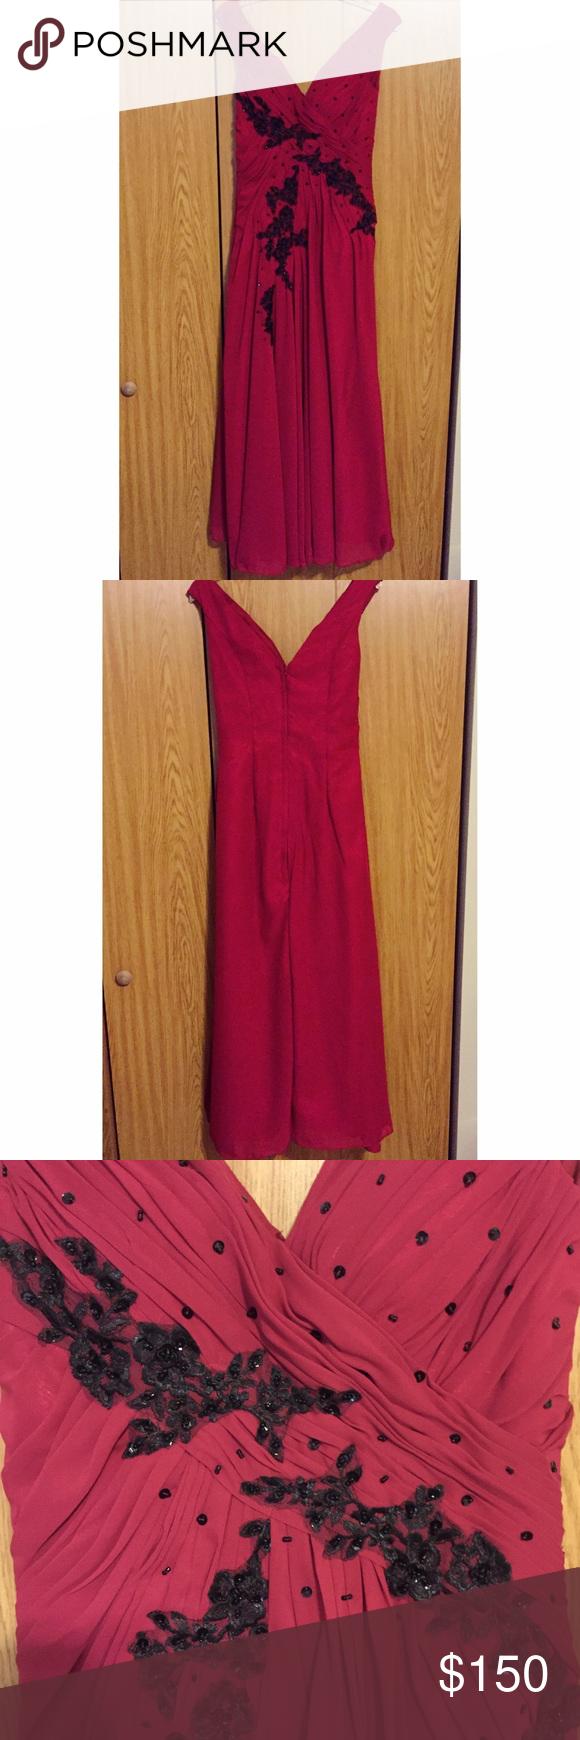 New red prom dress